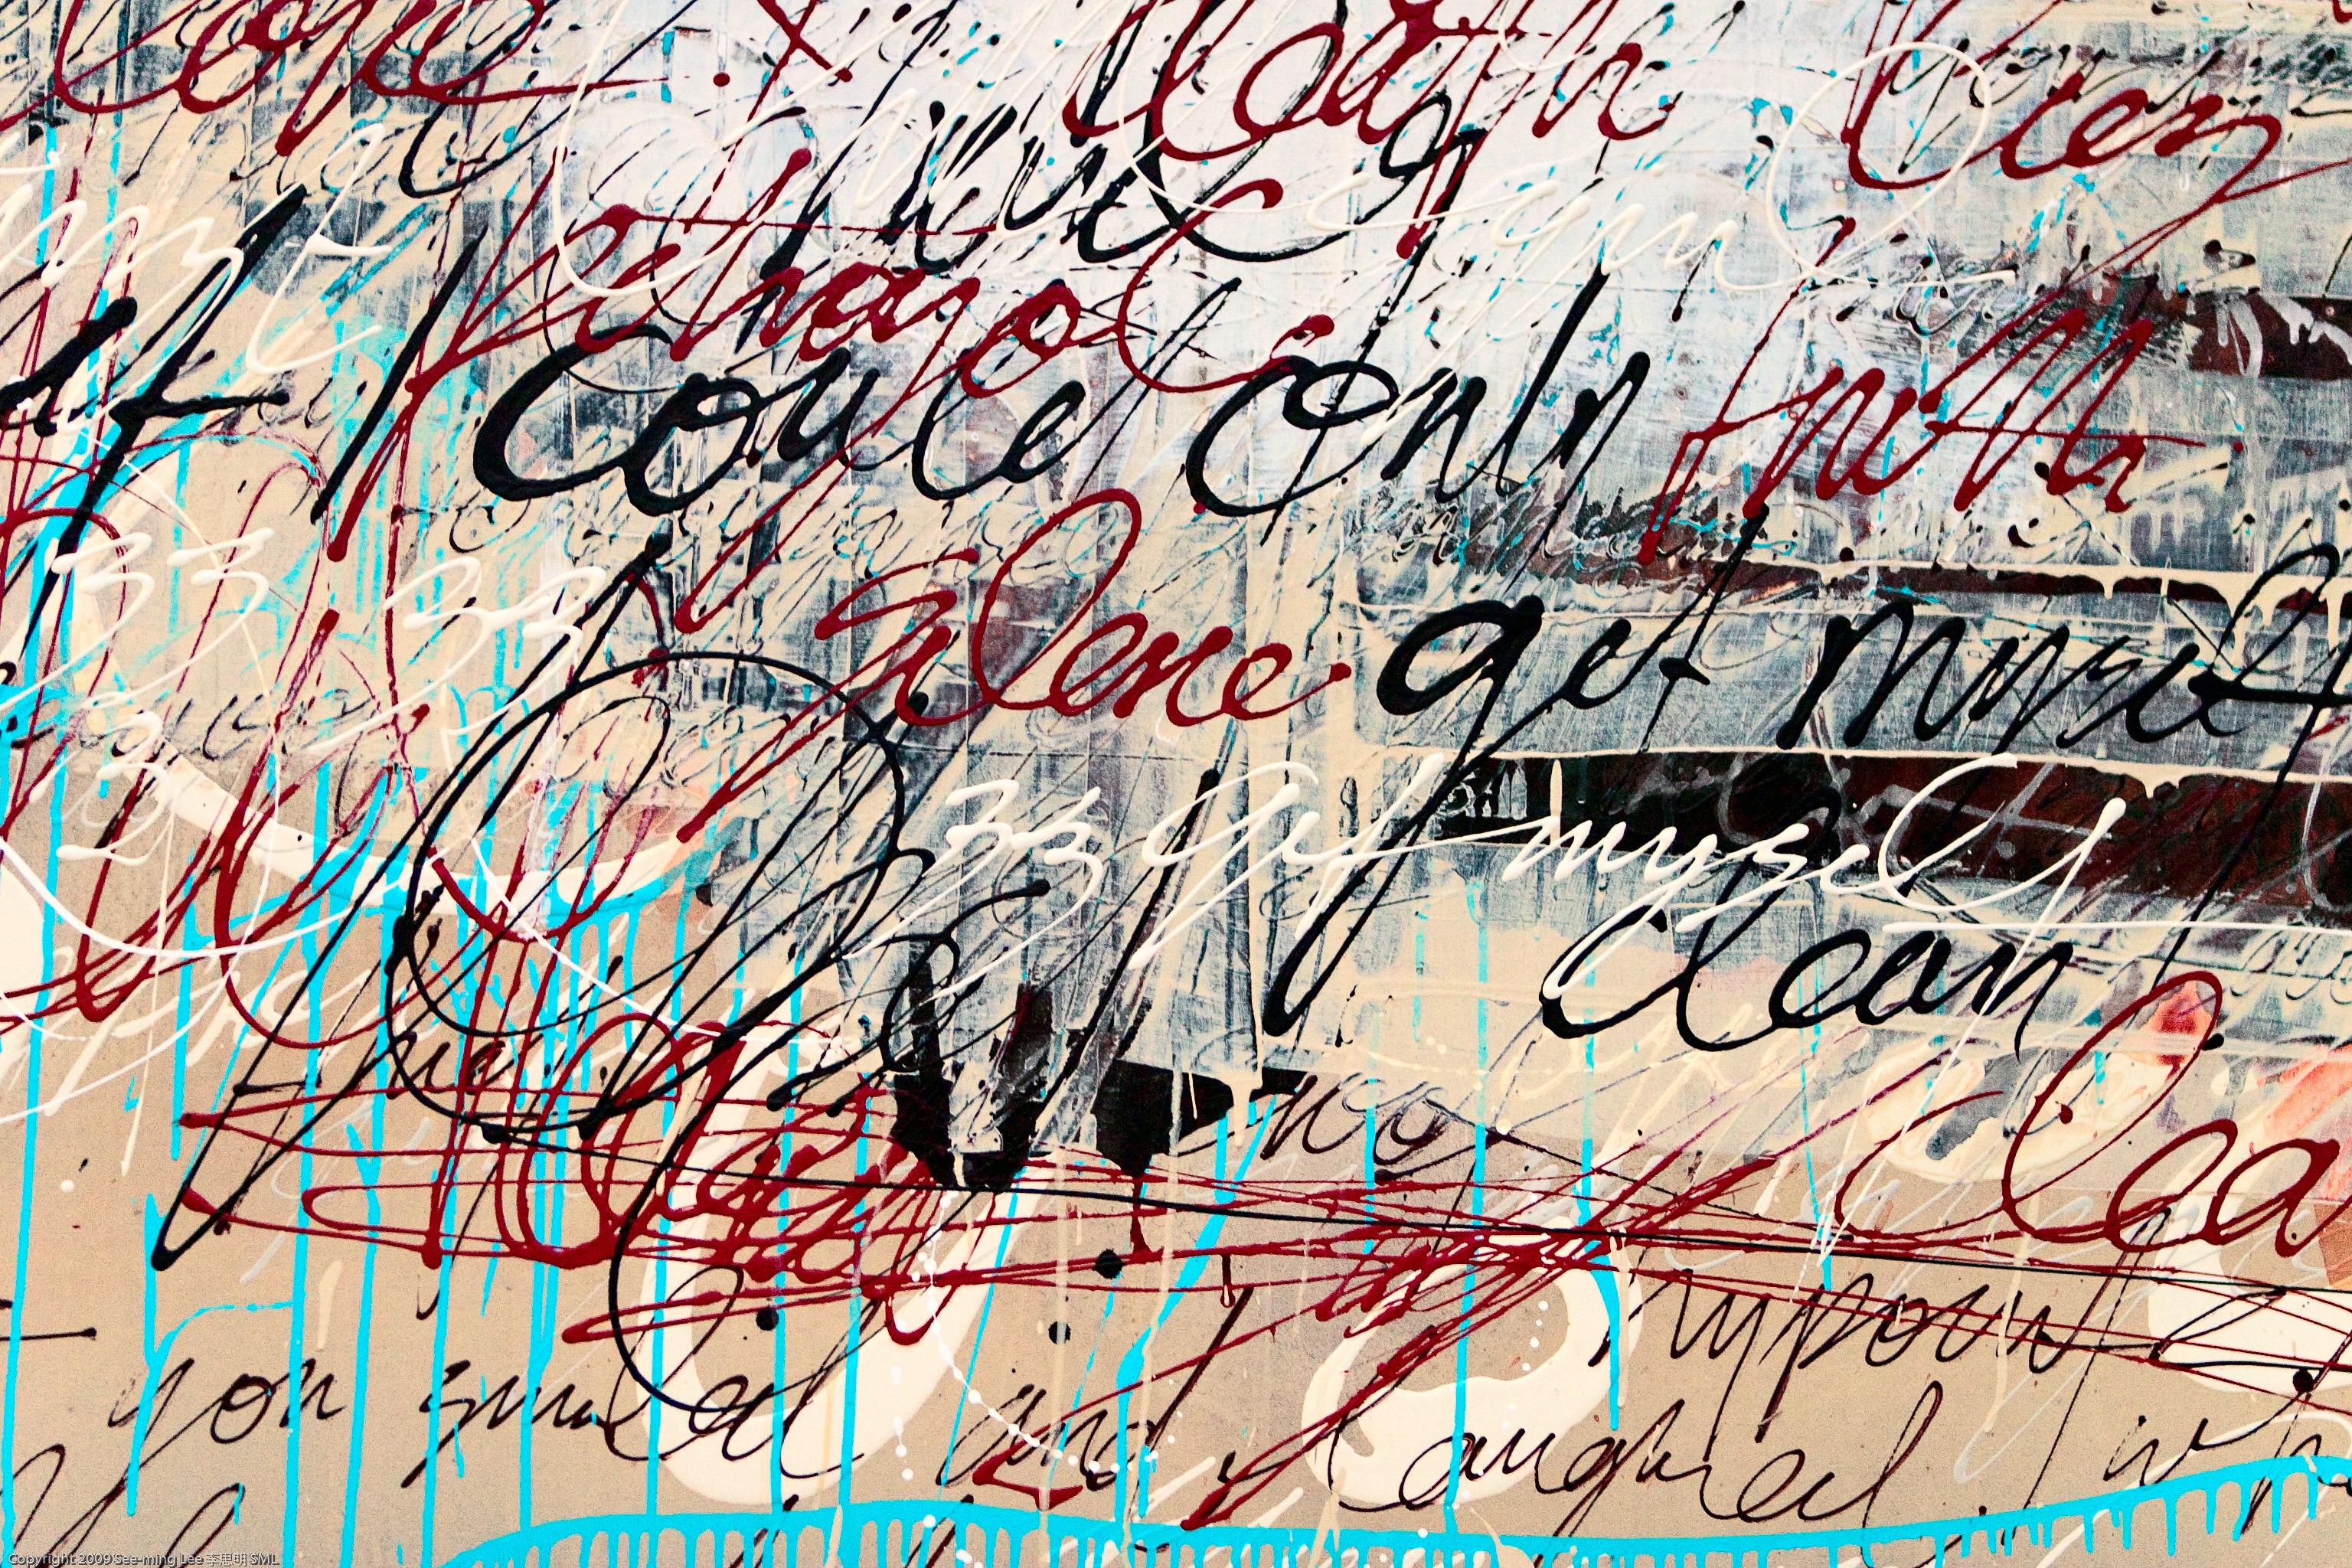 155246 Заставки и Обои Слова на телефон. Скачать Надписи, Слова, Краска, Стена картинки бесплатно